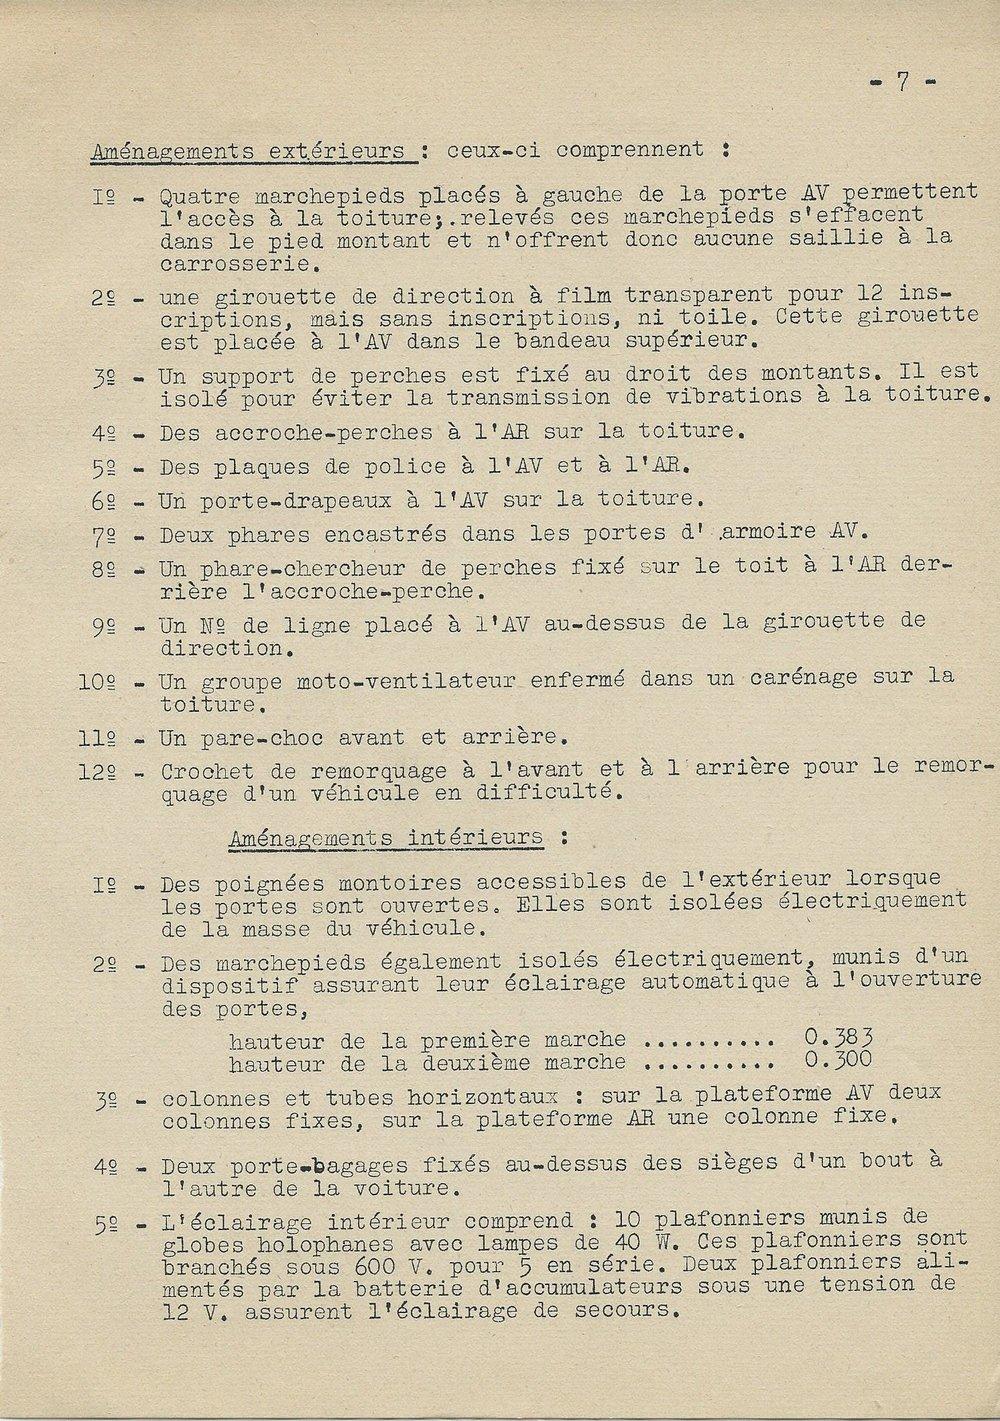 VRBh, série Aix-Marseille, str. 7